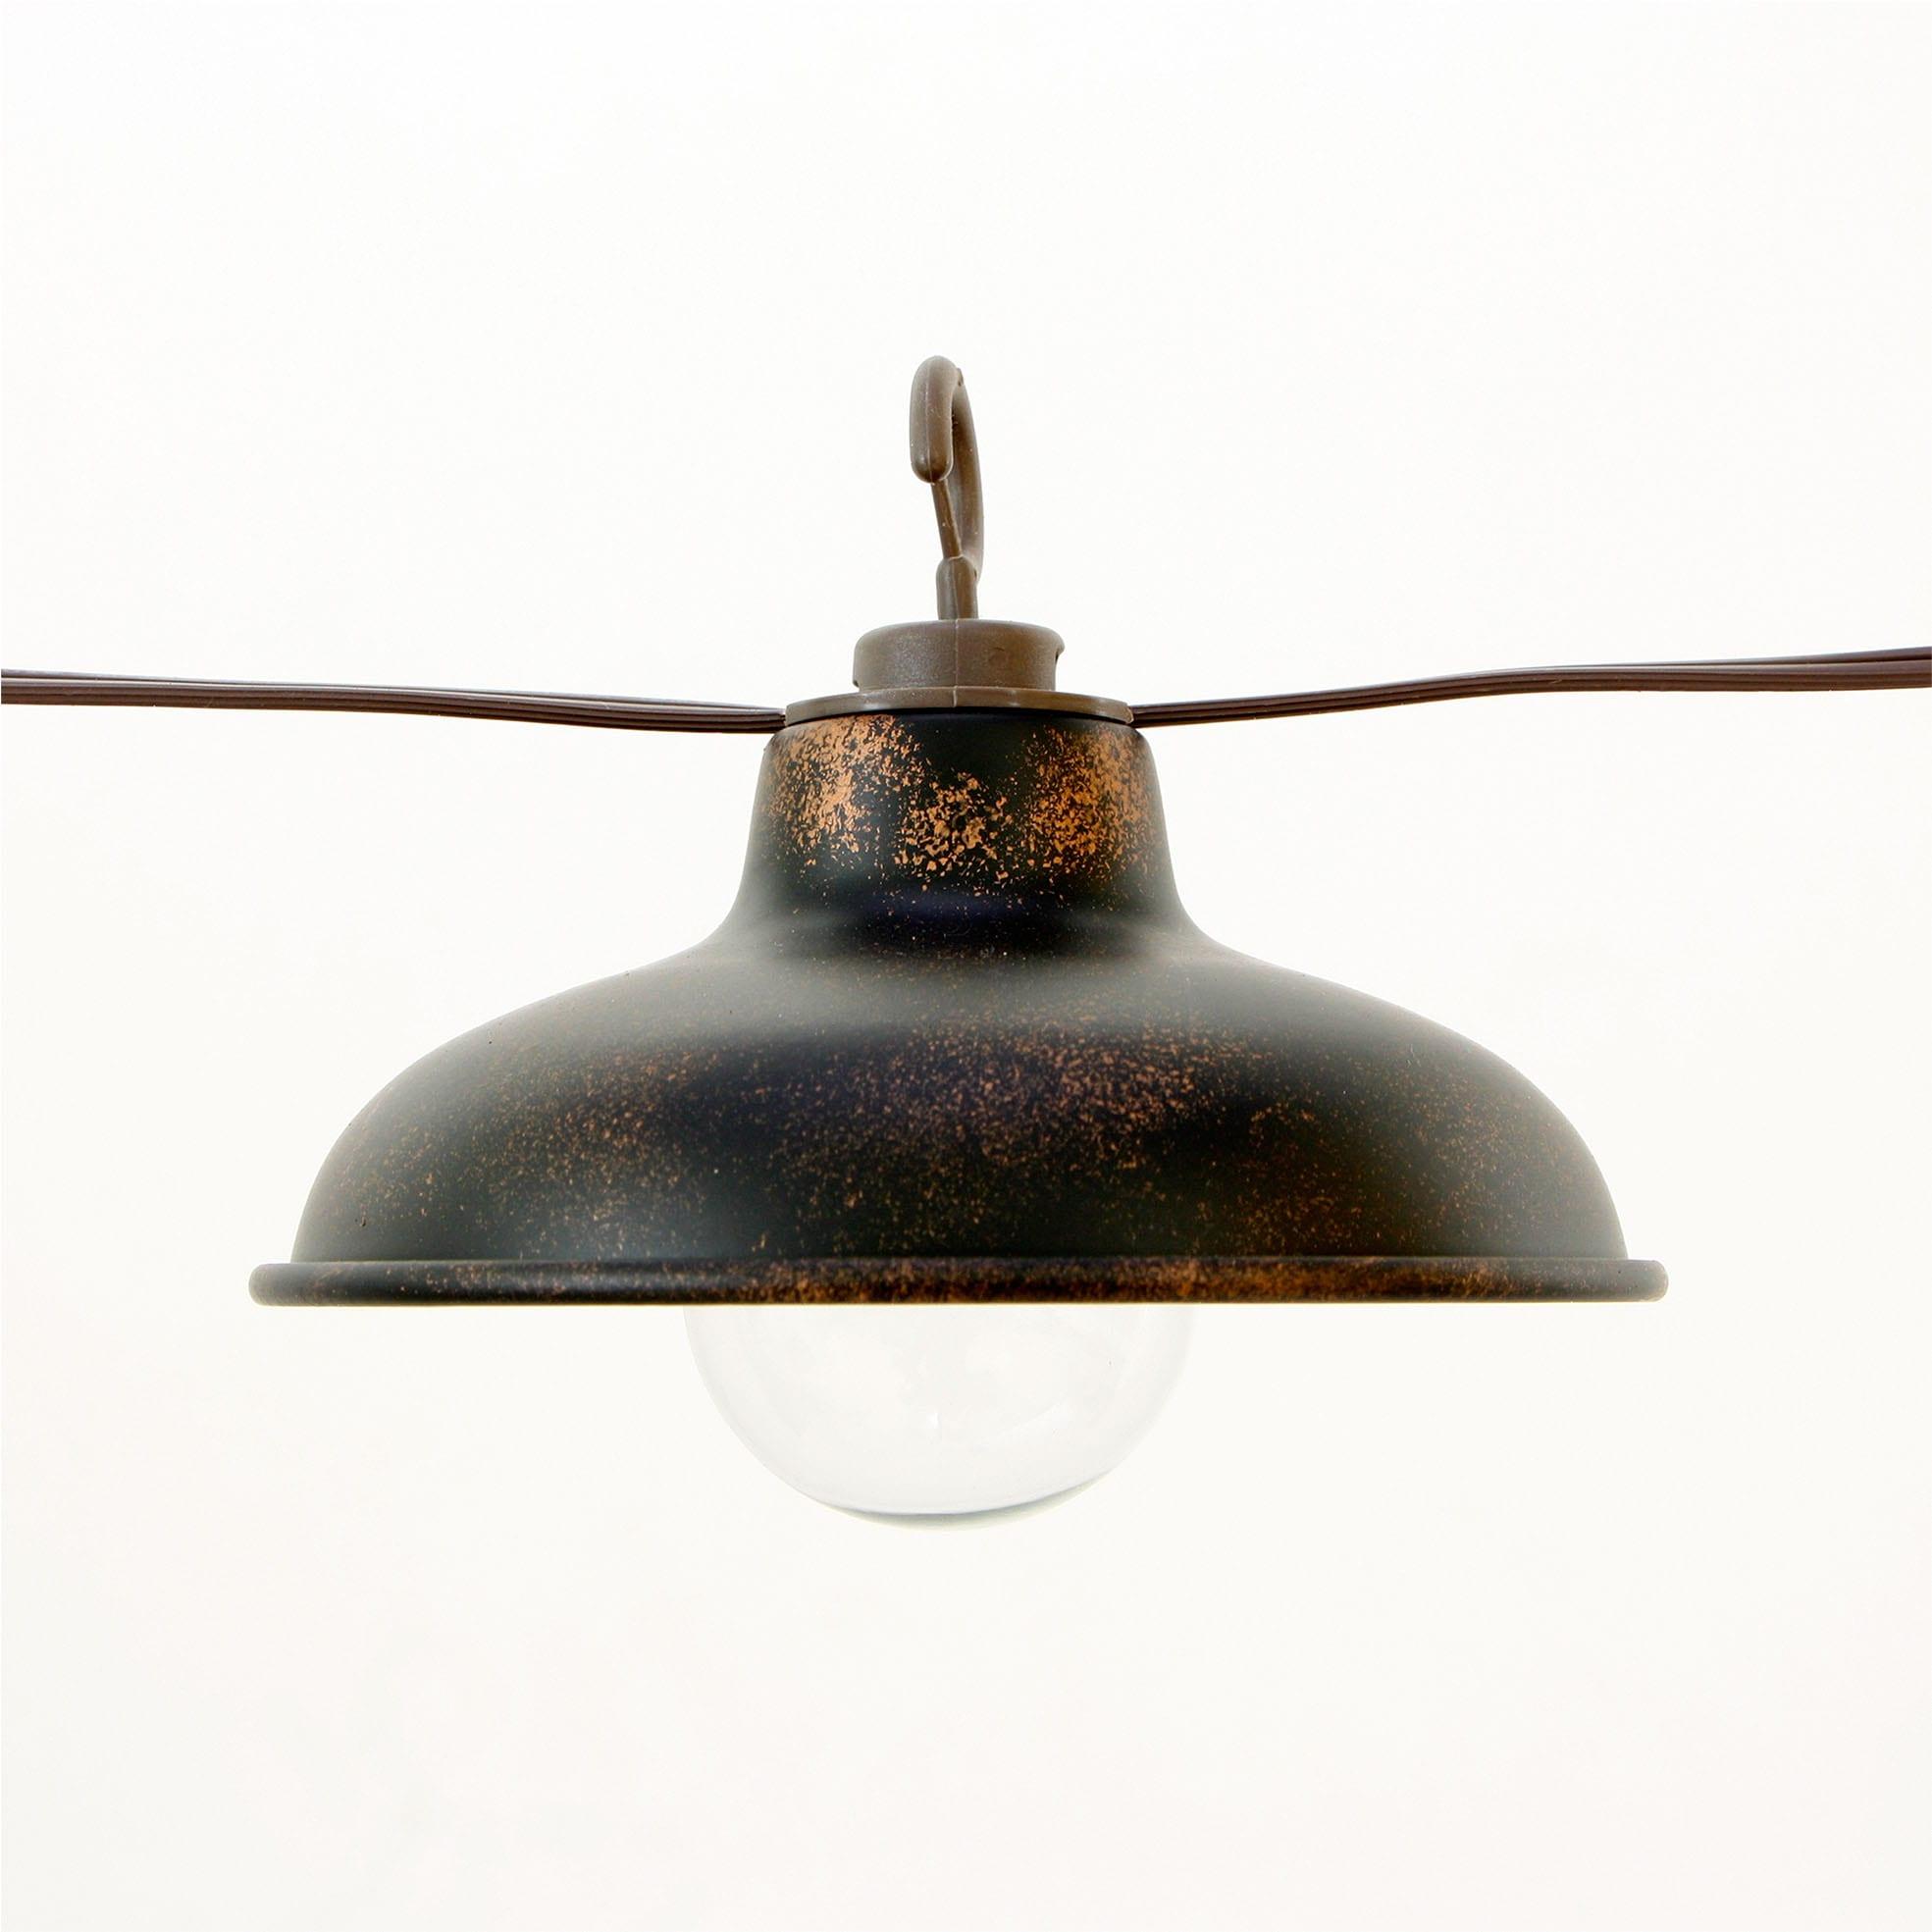 Prepainted Roof Steel Pineapple String Light - Cafe SL – Metal Shades  MYHH93151 – Zhongxin